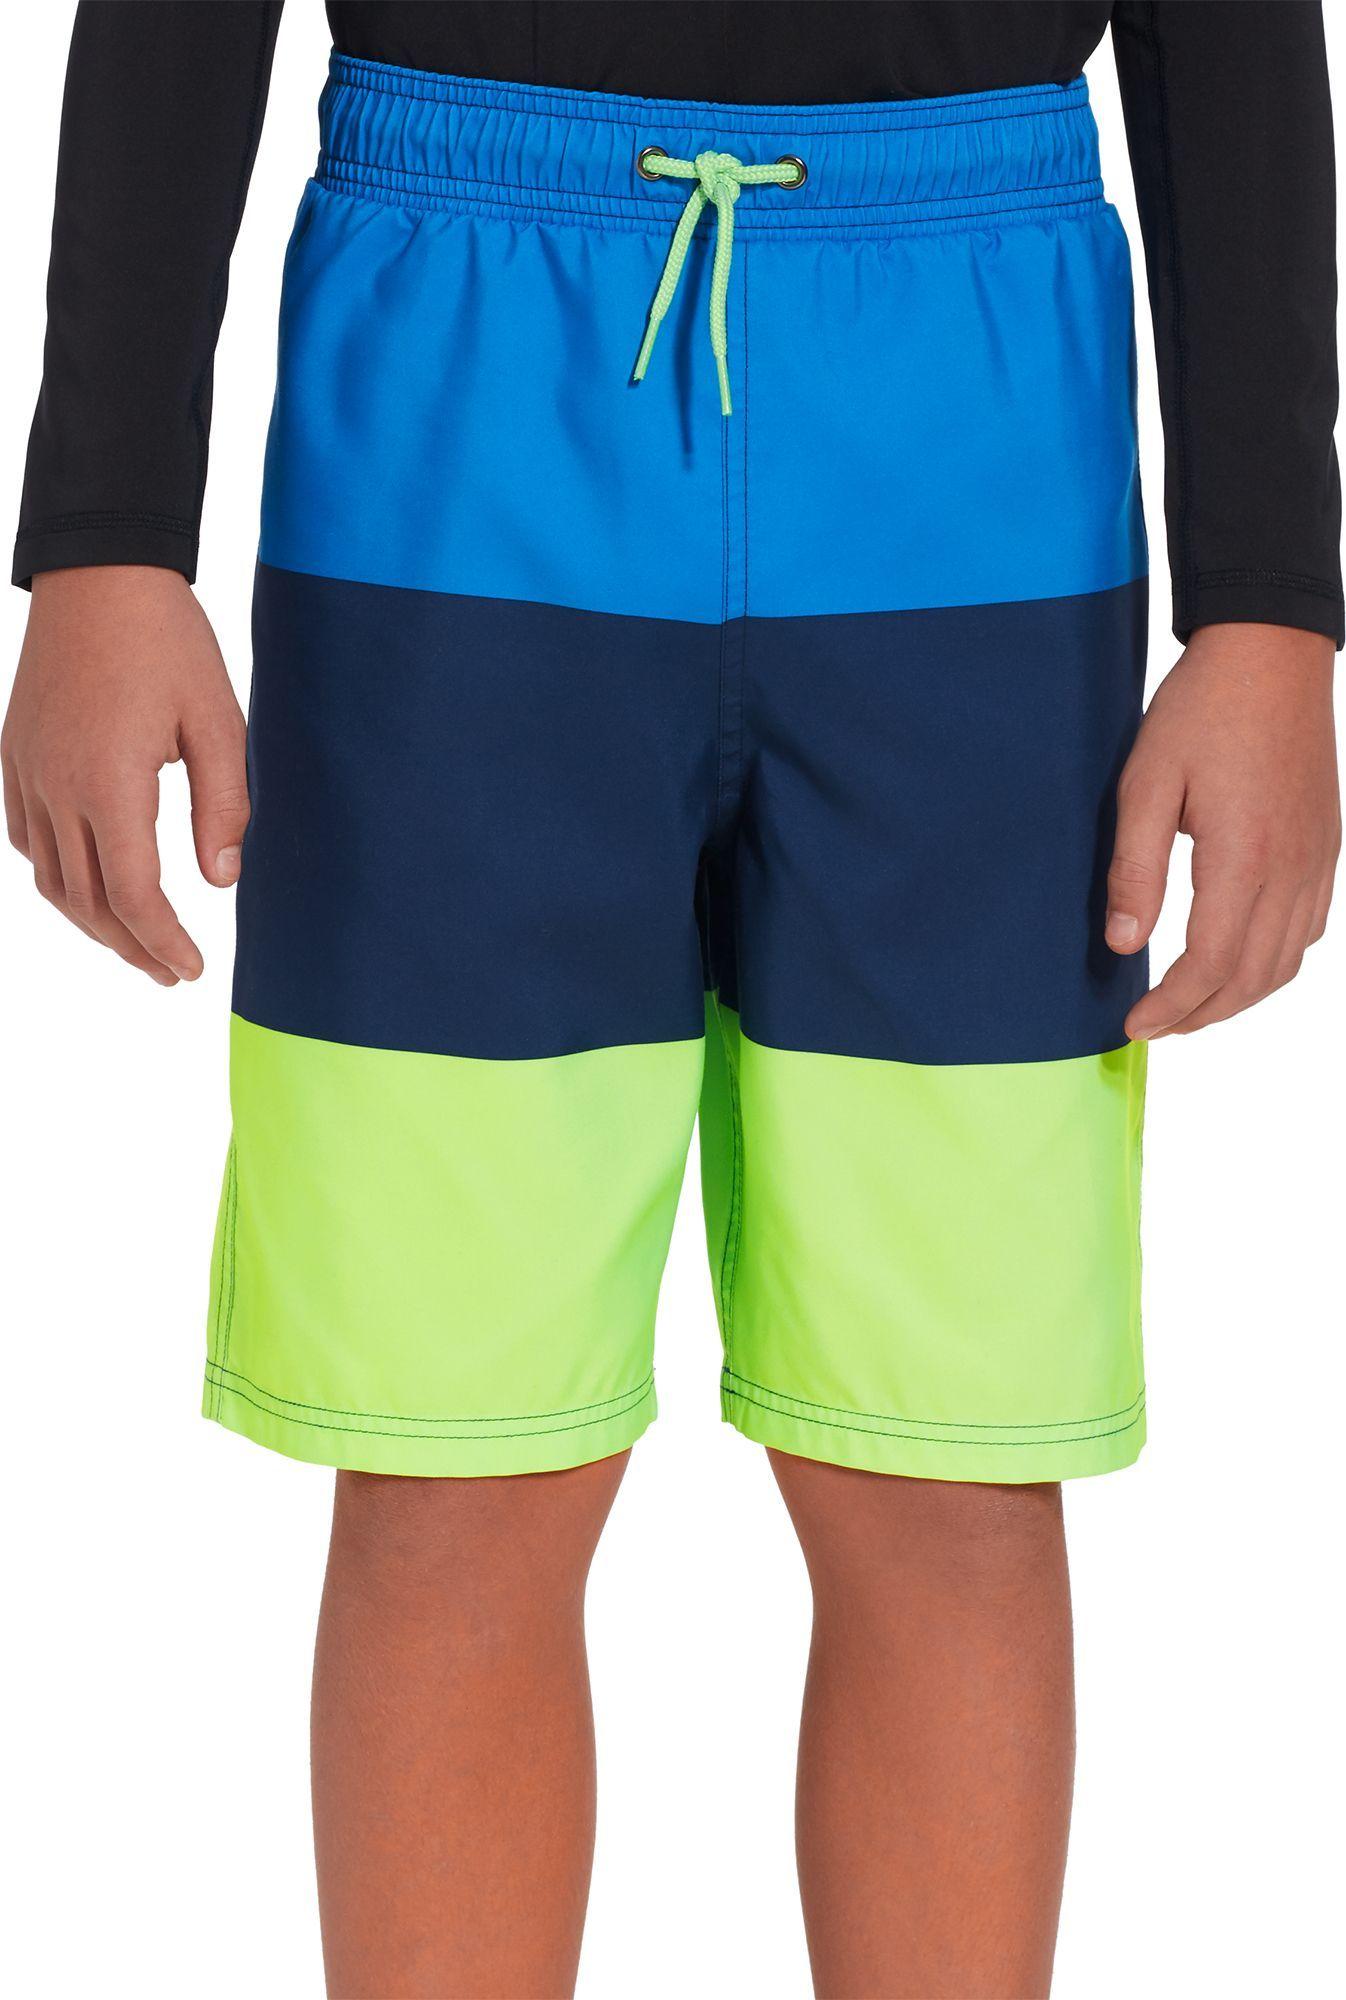 a27a3c0f31 Boys' Blake Swim Trunks | Products | Swim trunks, Trunks, Boys